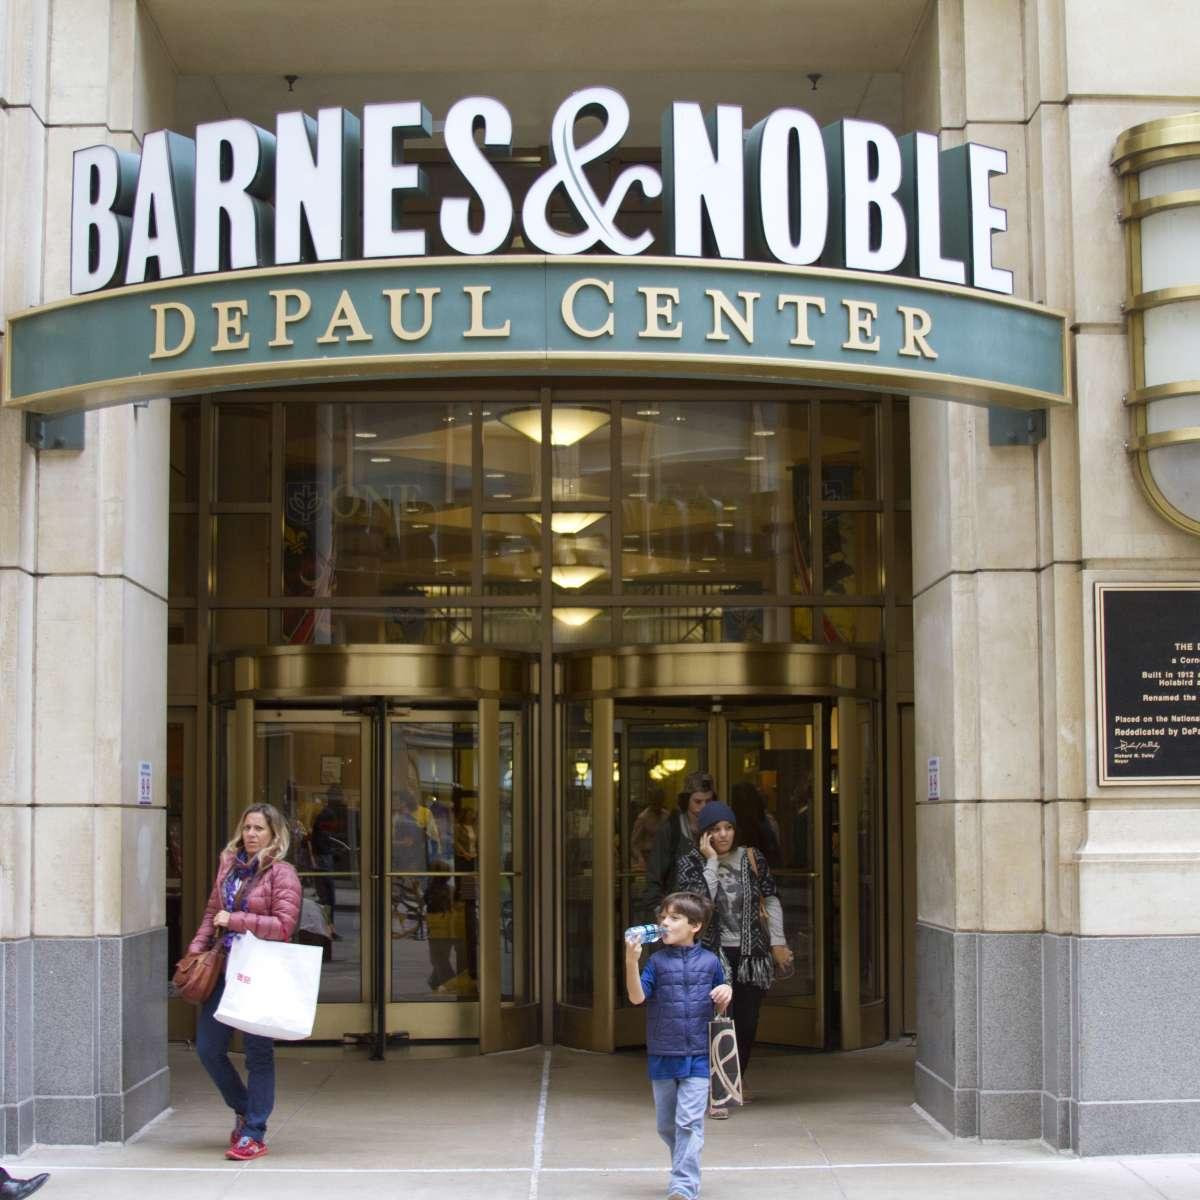 Barnes Noble Loop Chicago